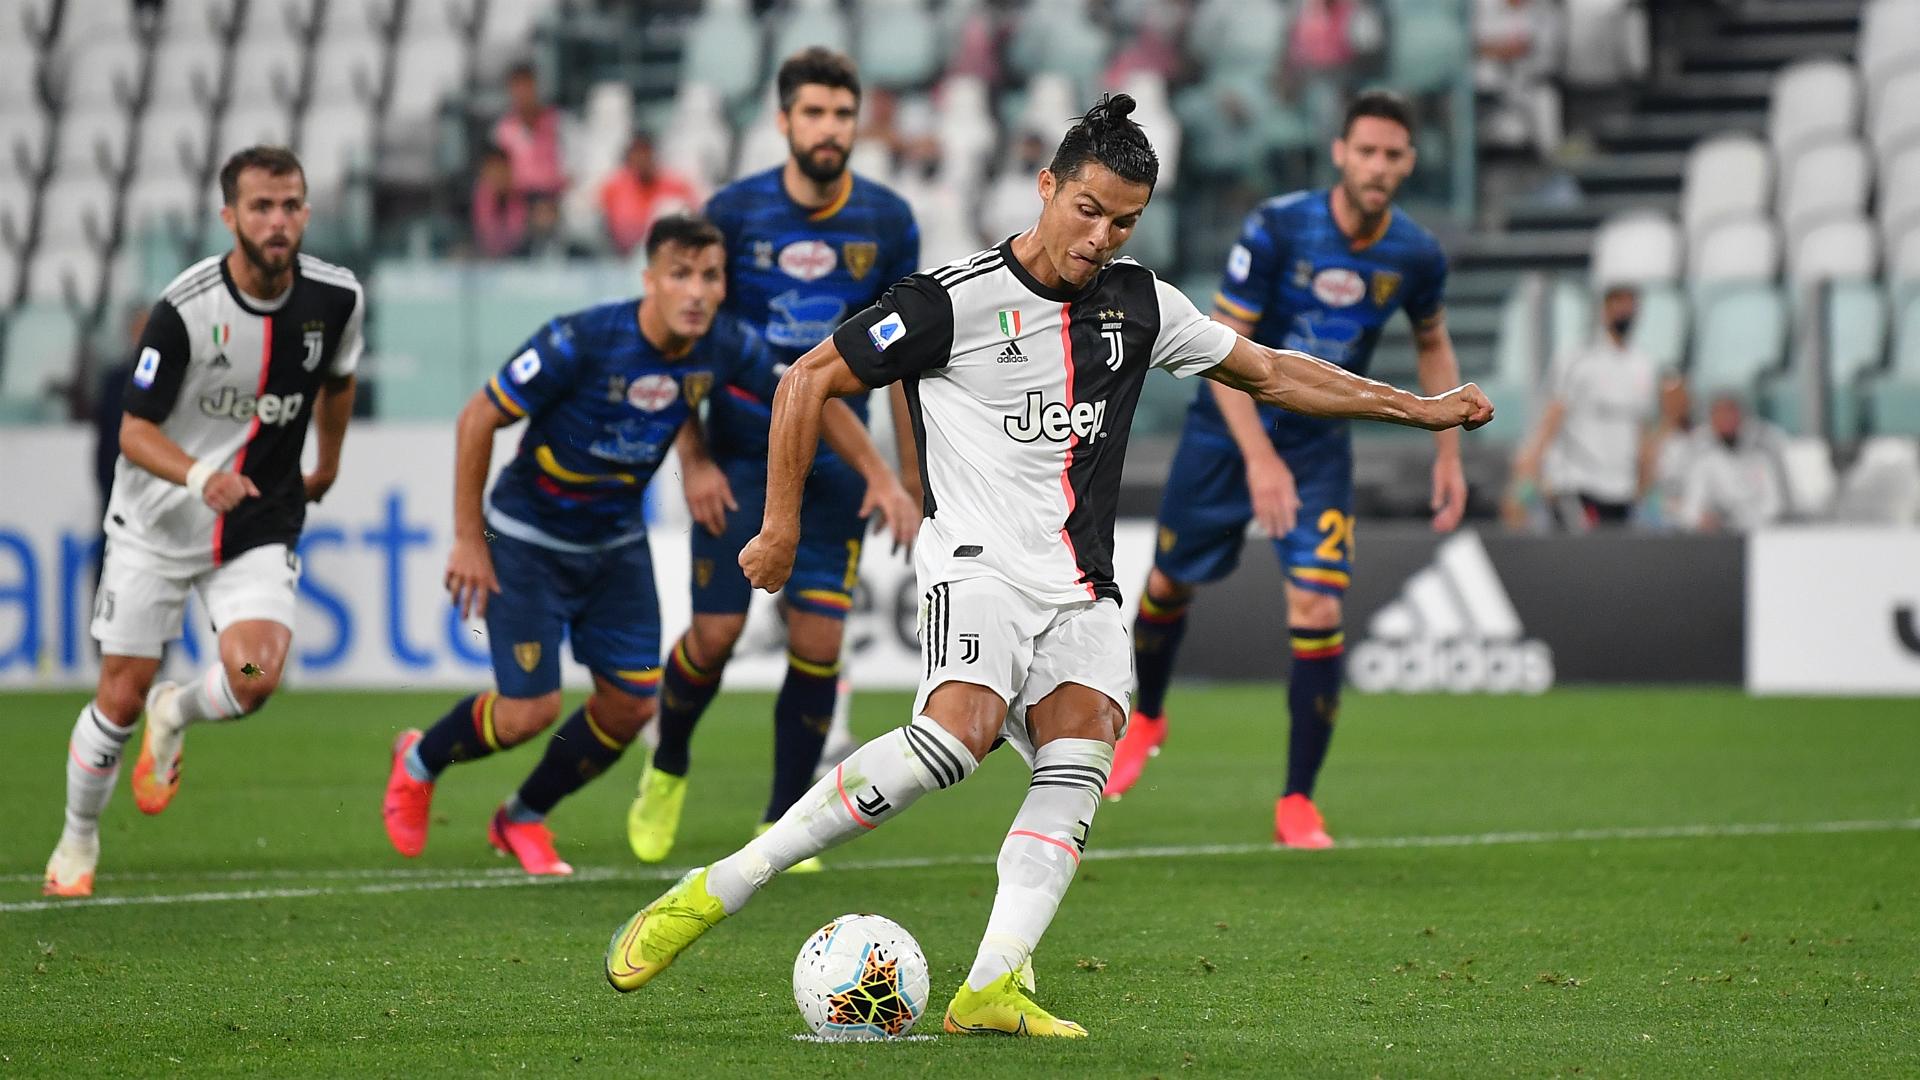 Juventus 4-0 Lecce: Dybala, Ronaldo and Higuain help open up seven-point gap